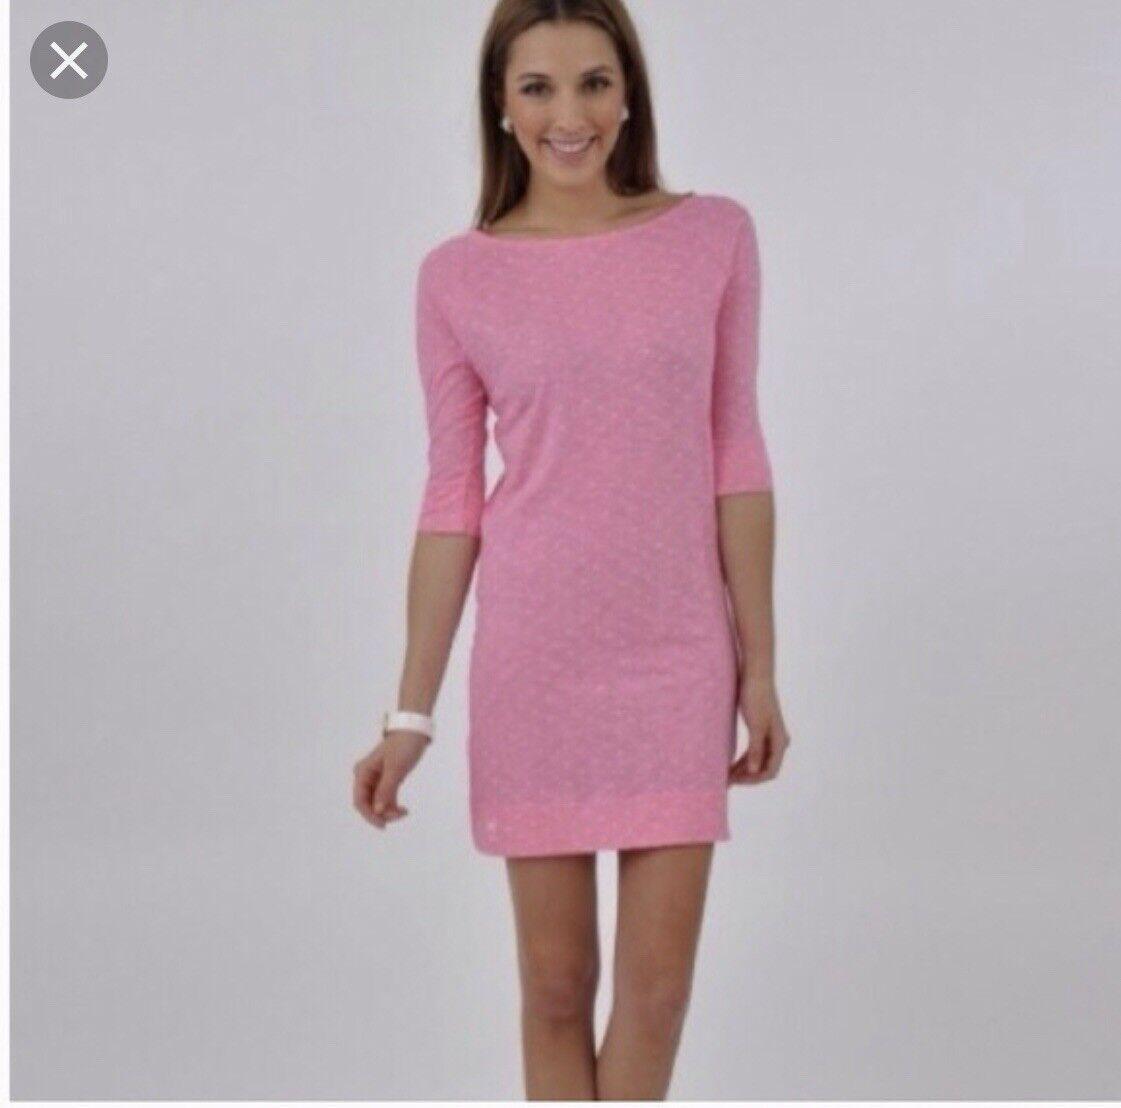 Lilly pulitzer Cassie Polka Dot Pink Dress XS